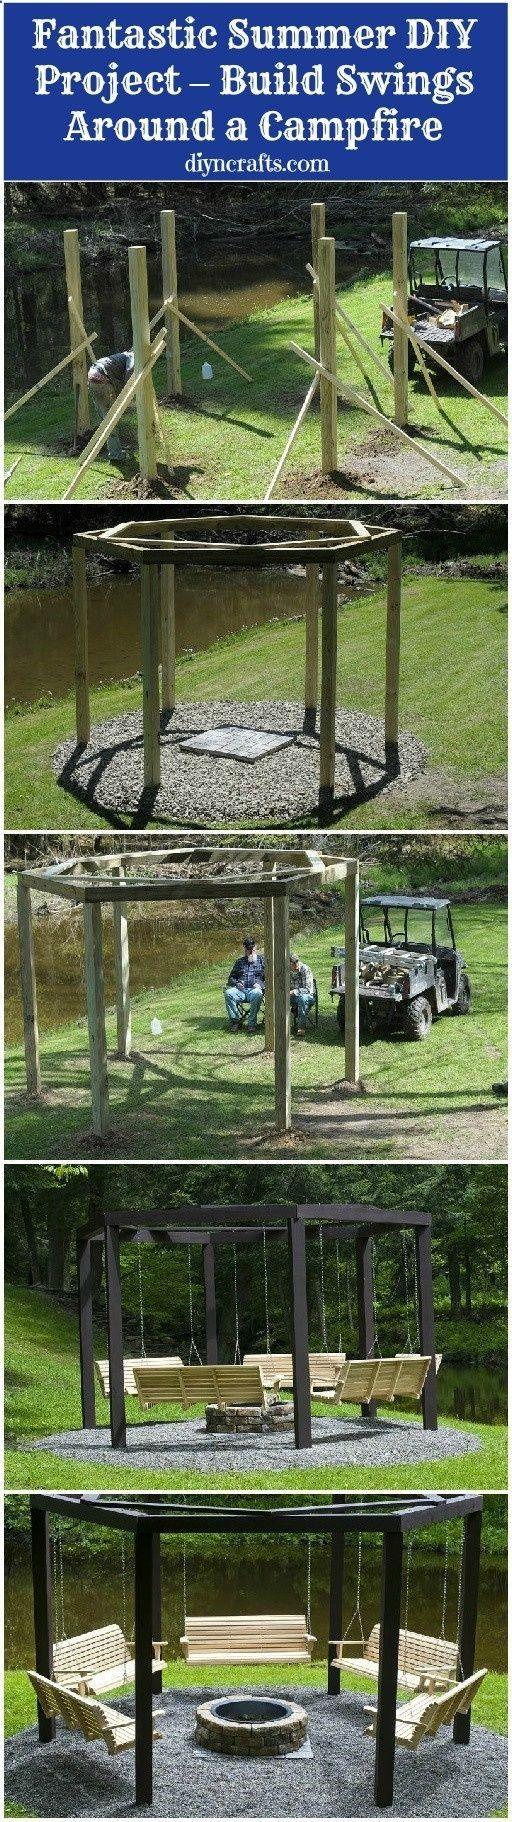 Fantastic Summer DIY Project  Build Swings Around a Campfire